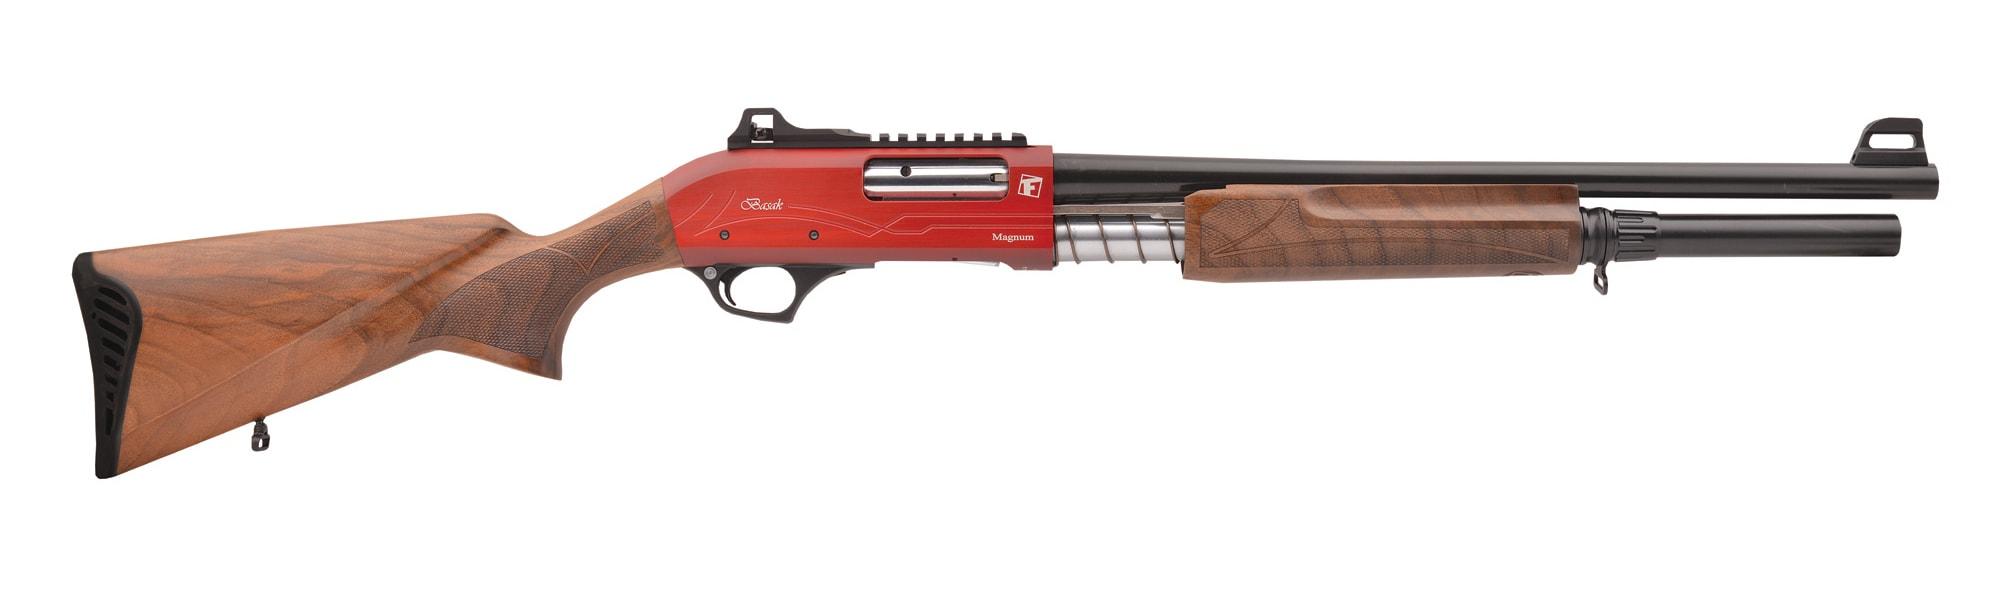 Başak P Magnum Kırmızı